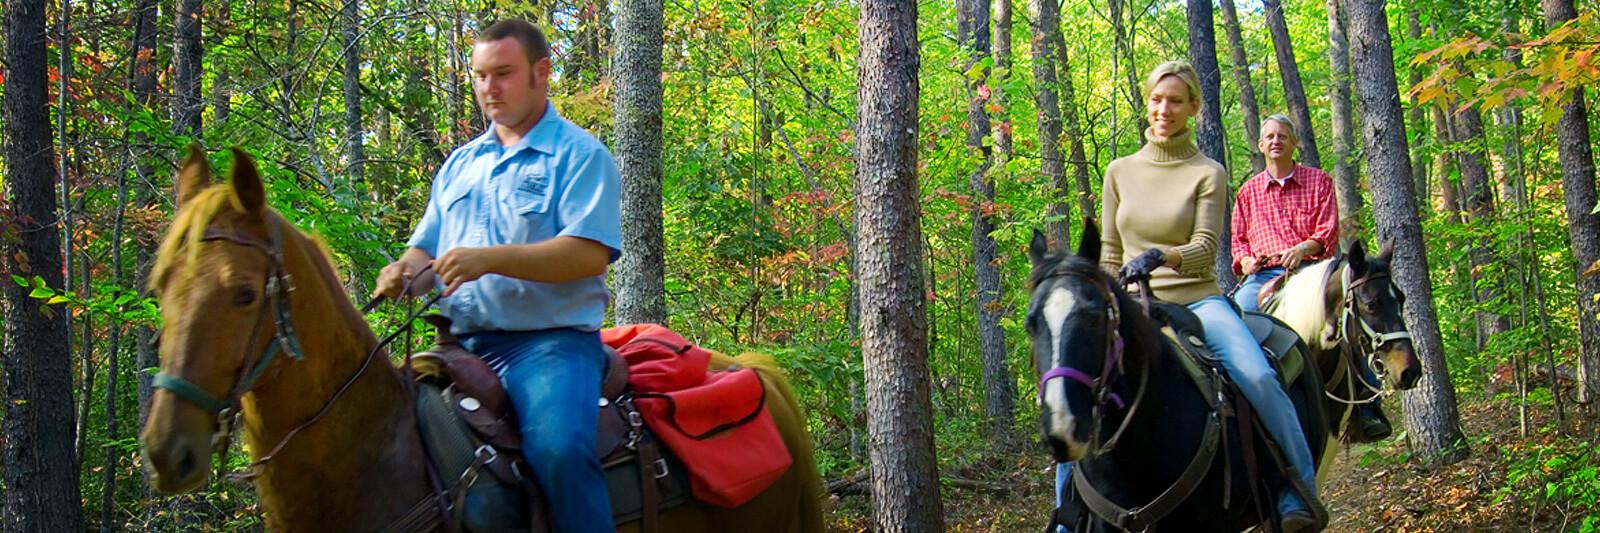 Brasstown-Valley-Trail-Horseback-Riding-Georgia-Stables-1